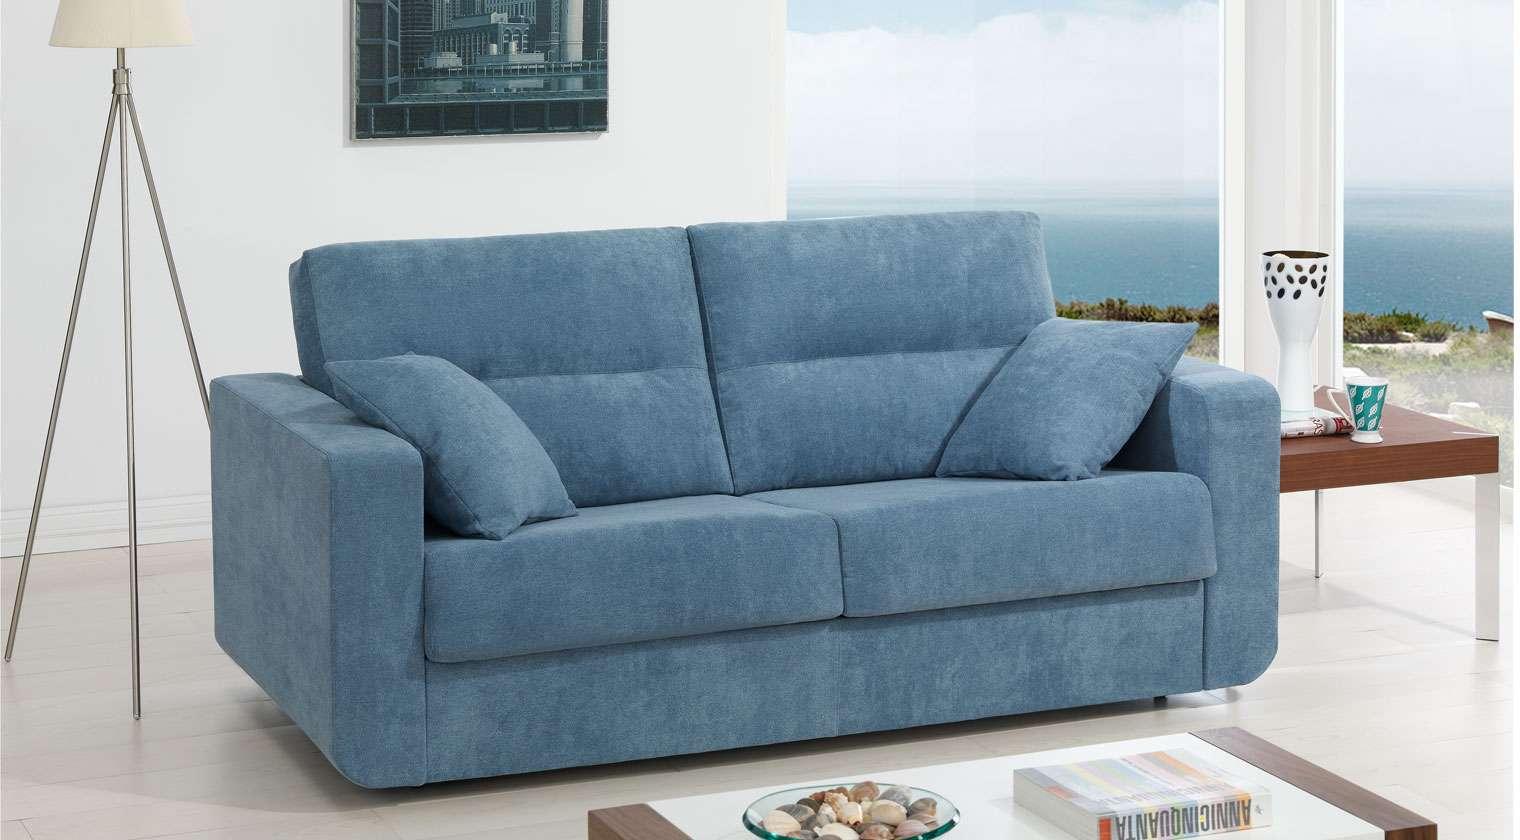 Sofas camas baratos en las palmas de gran canaria for Sofa cama barato online